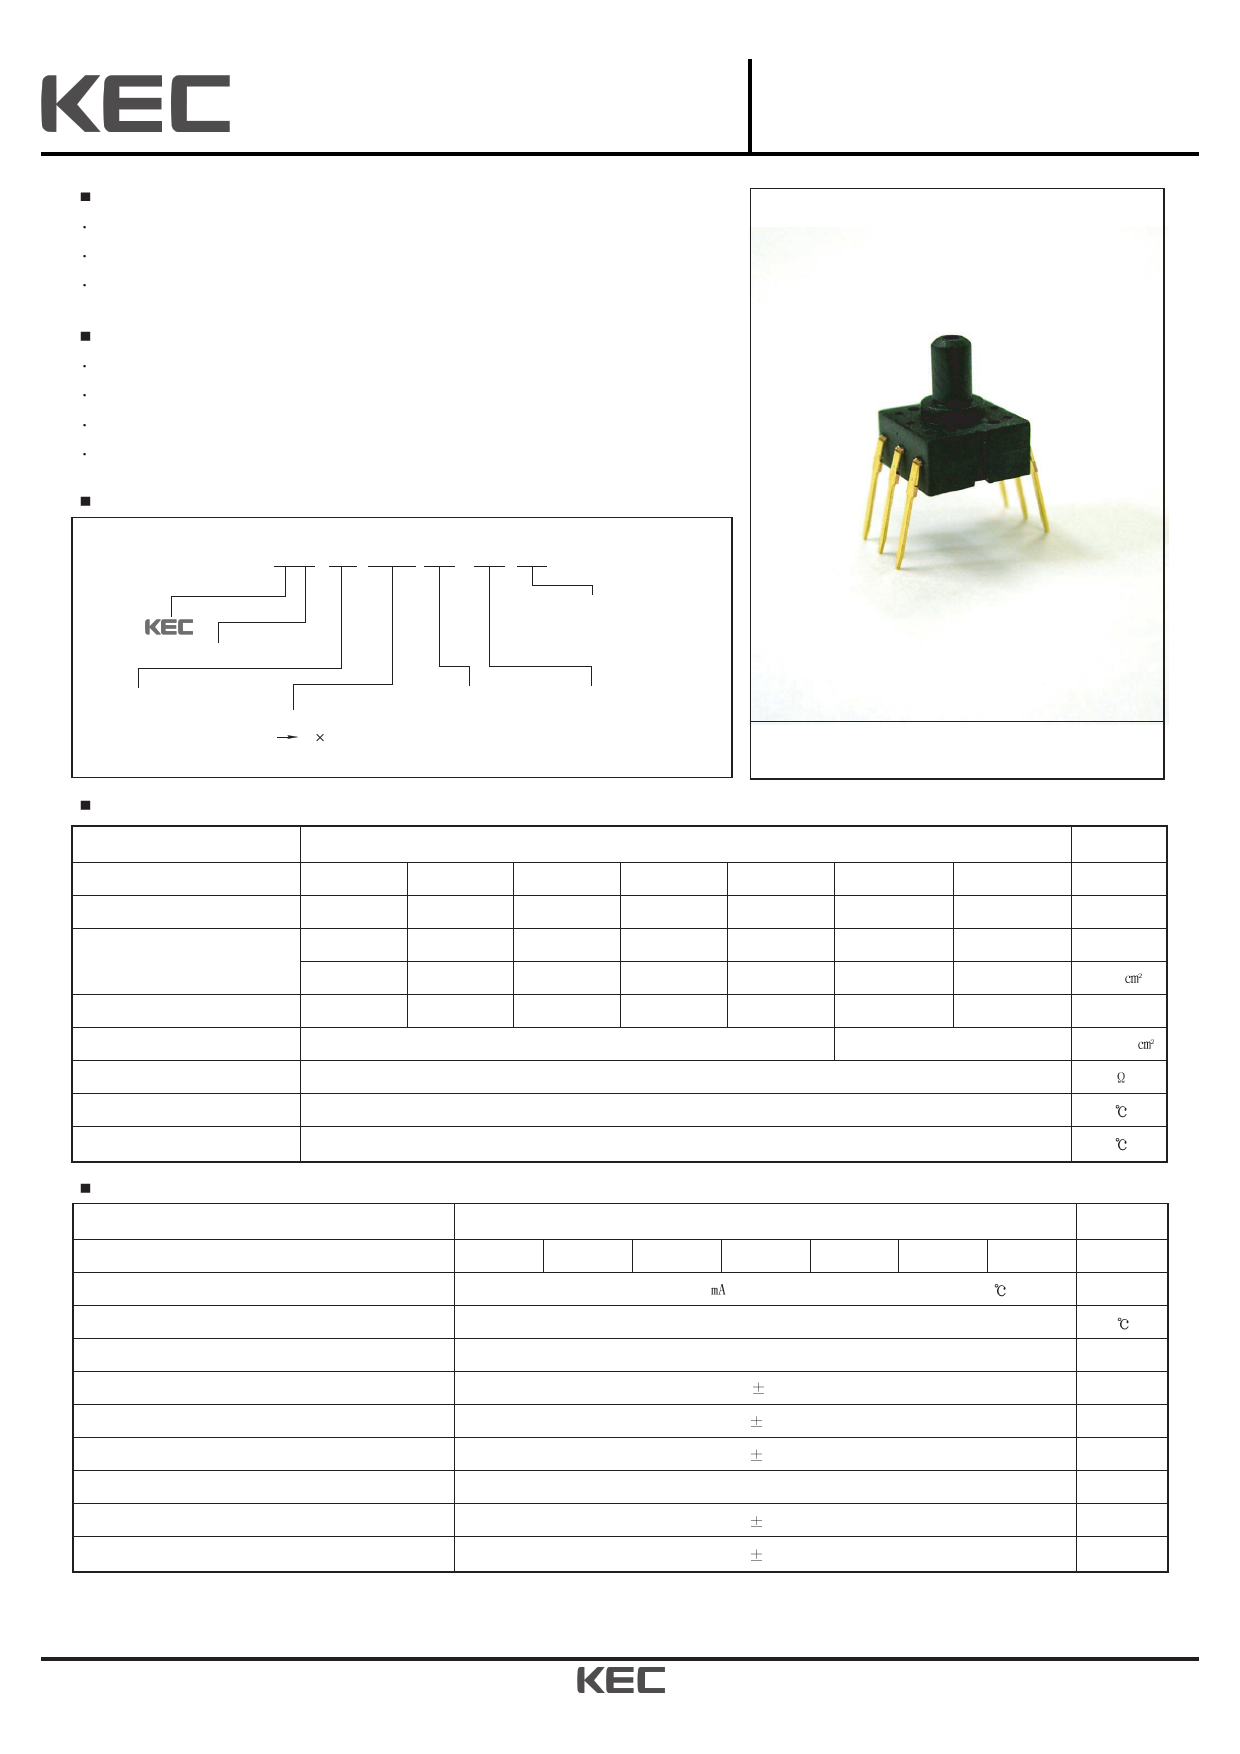 KPF801G01 데이터시트 및 KPF801G01 PDF